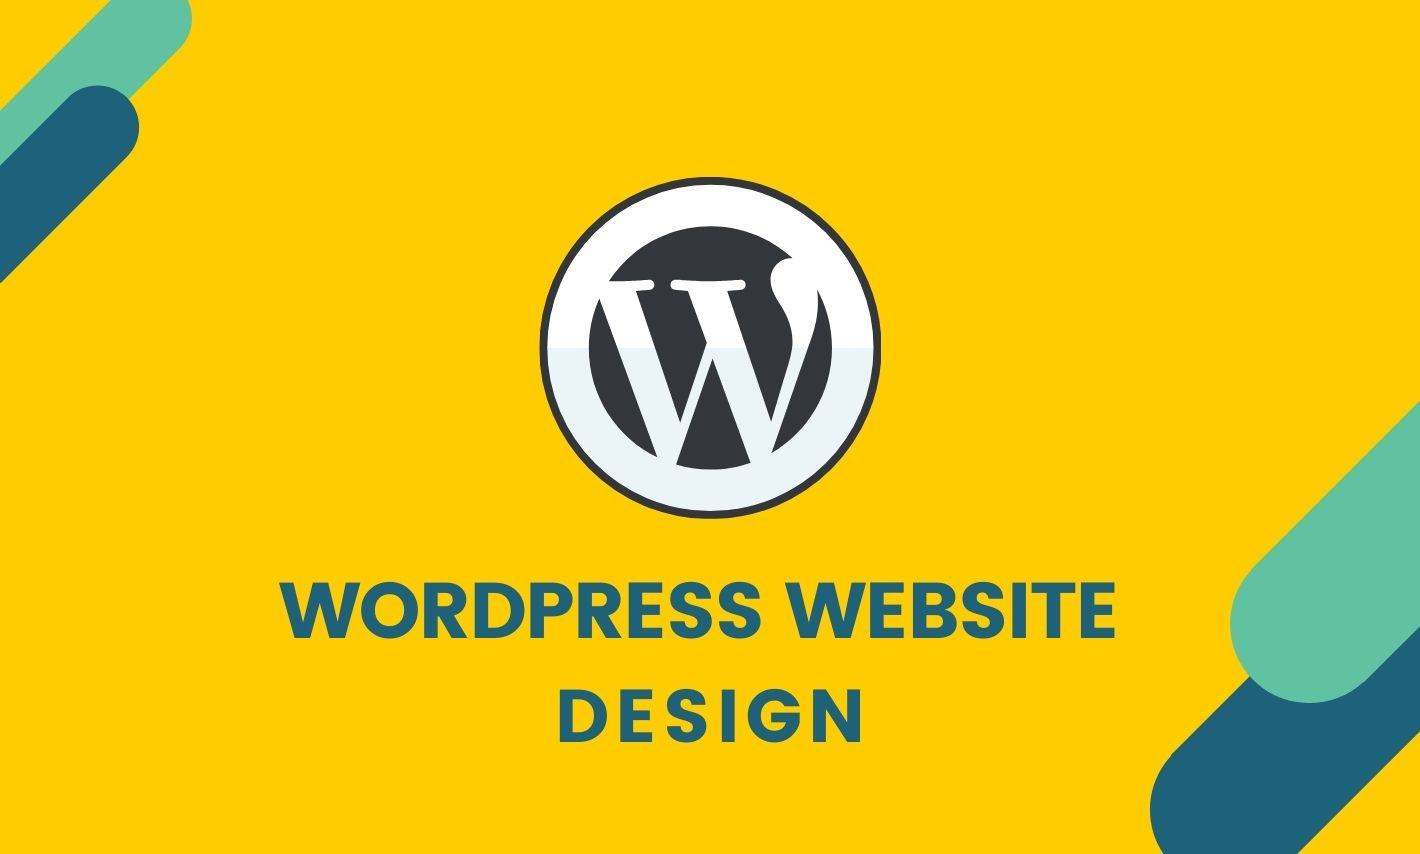 I will build wordpress website design and development